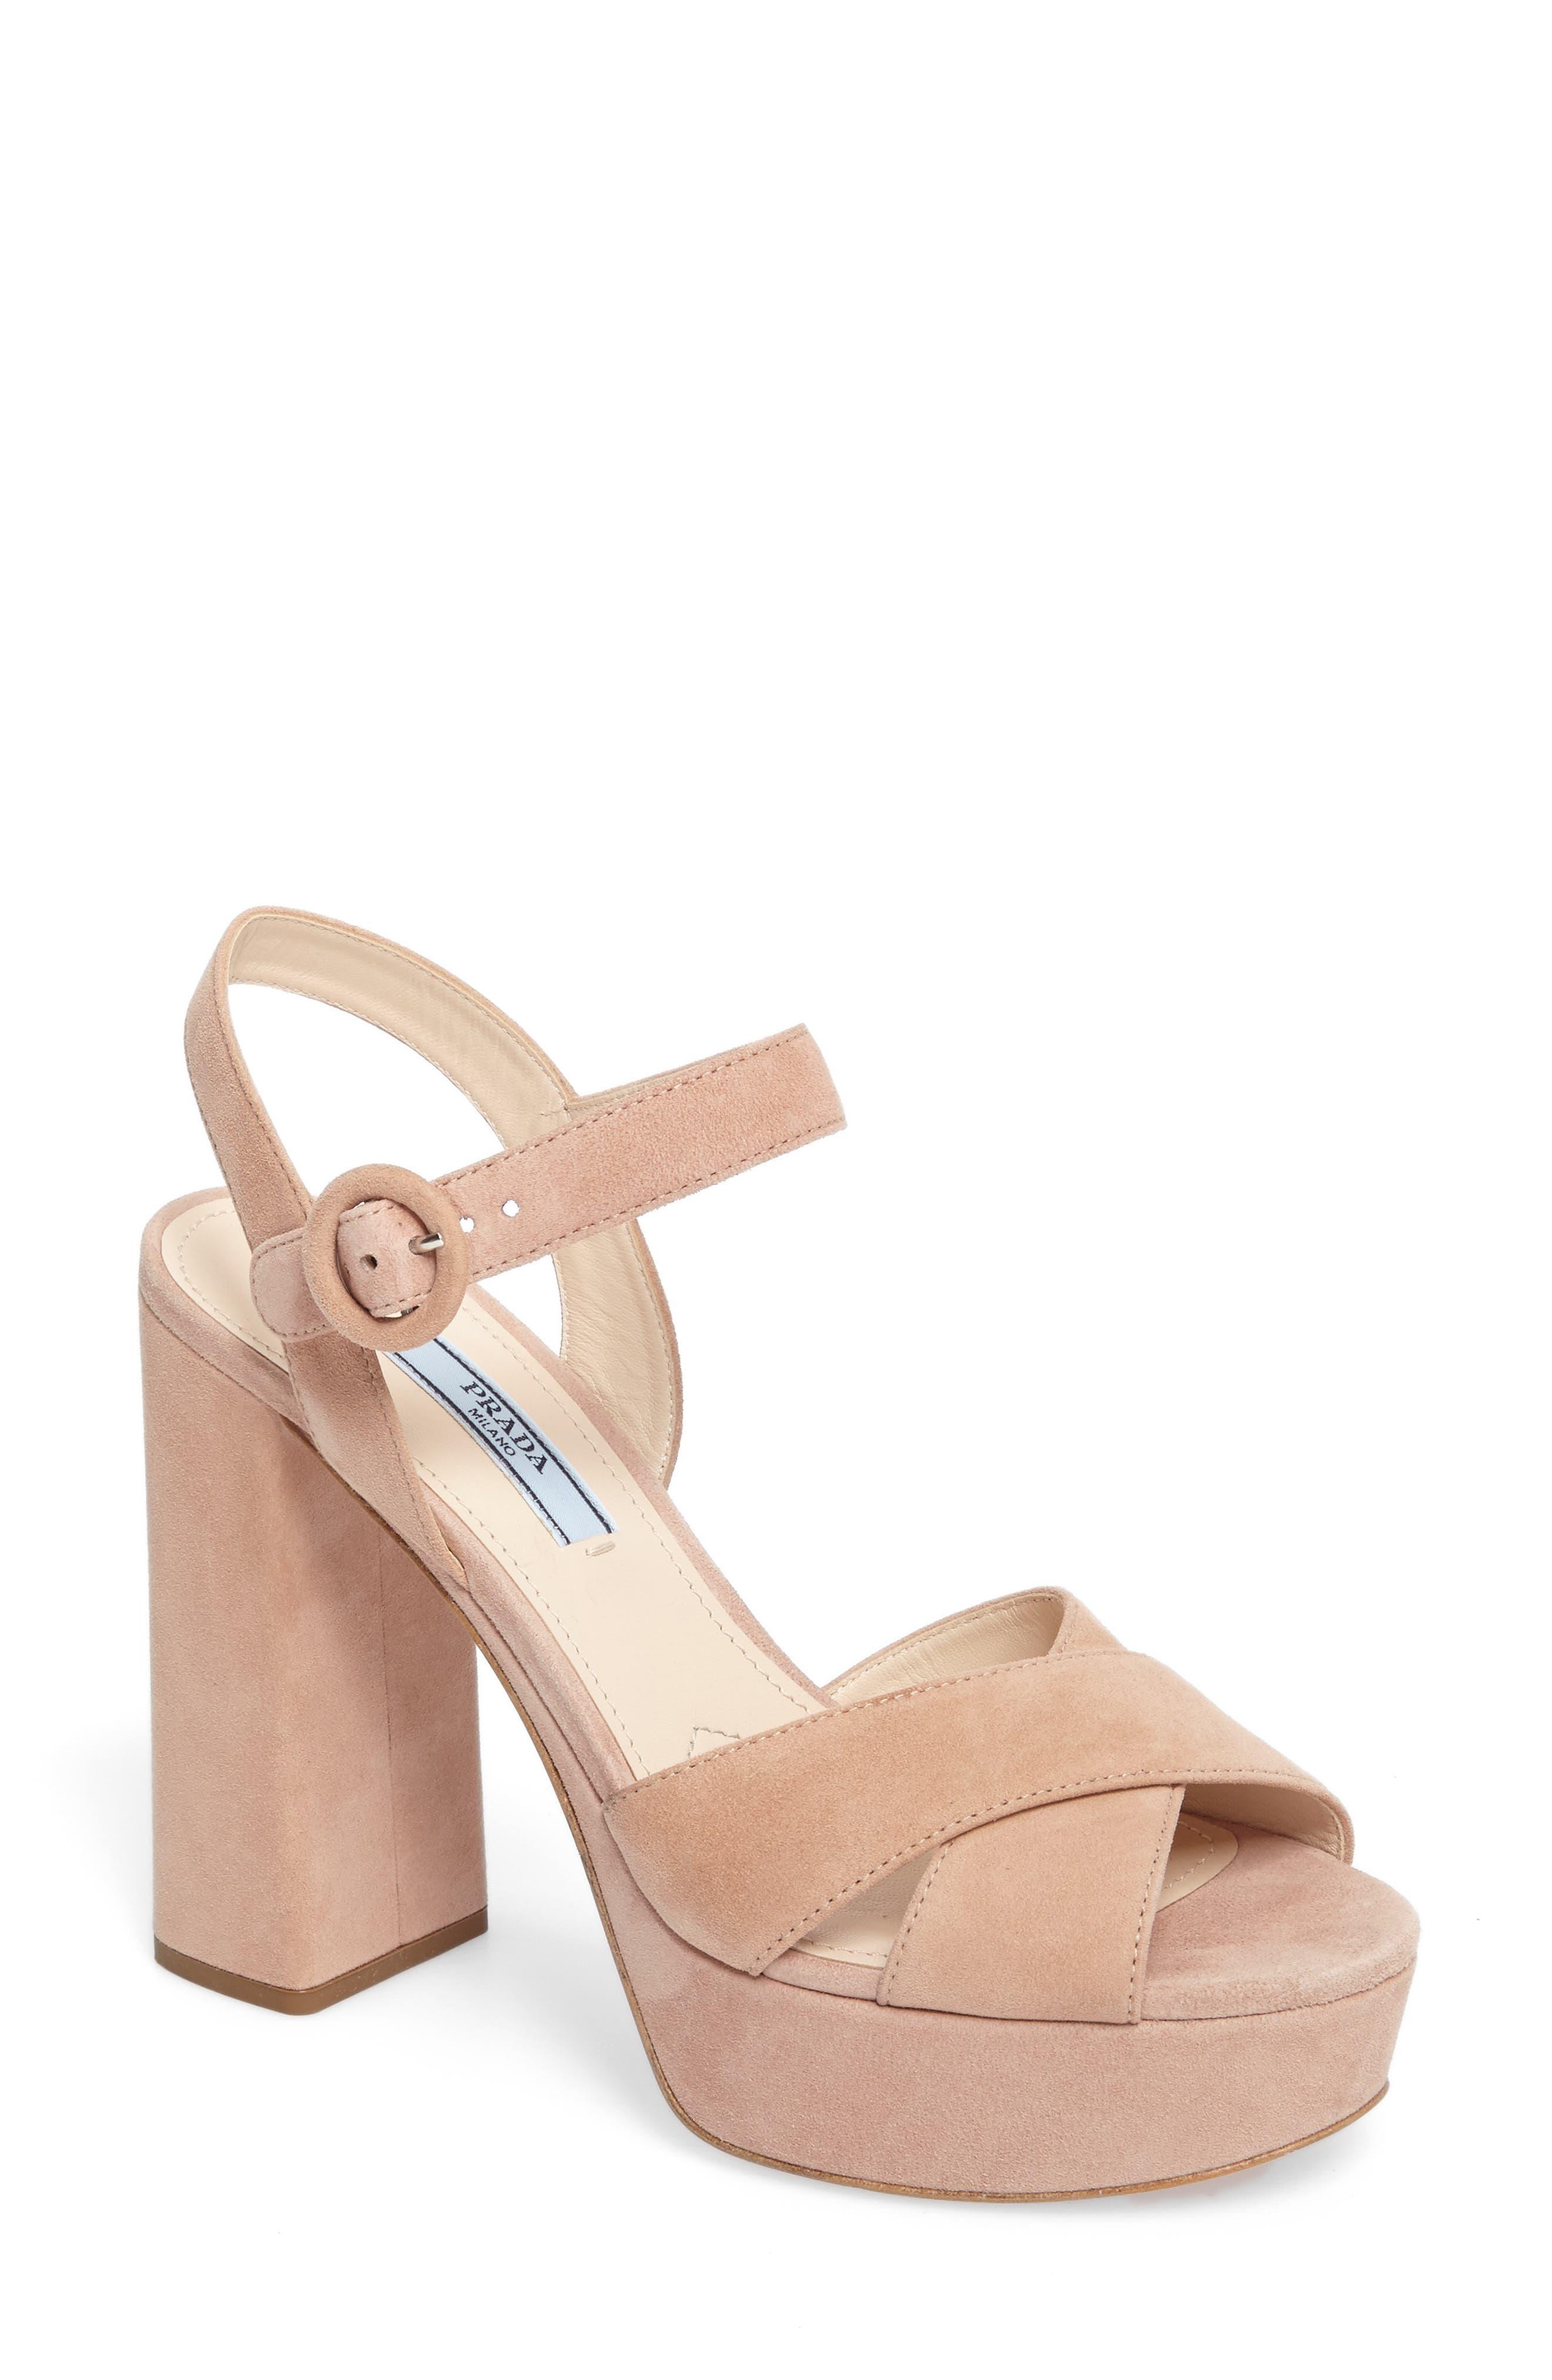 Alternate Image 1 Selected - Prada Block Heel Platform Sandal (Women)